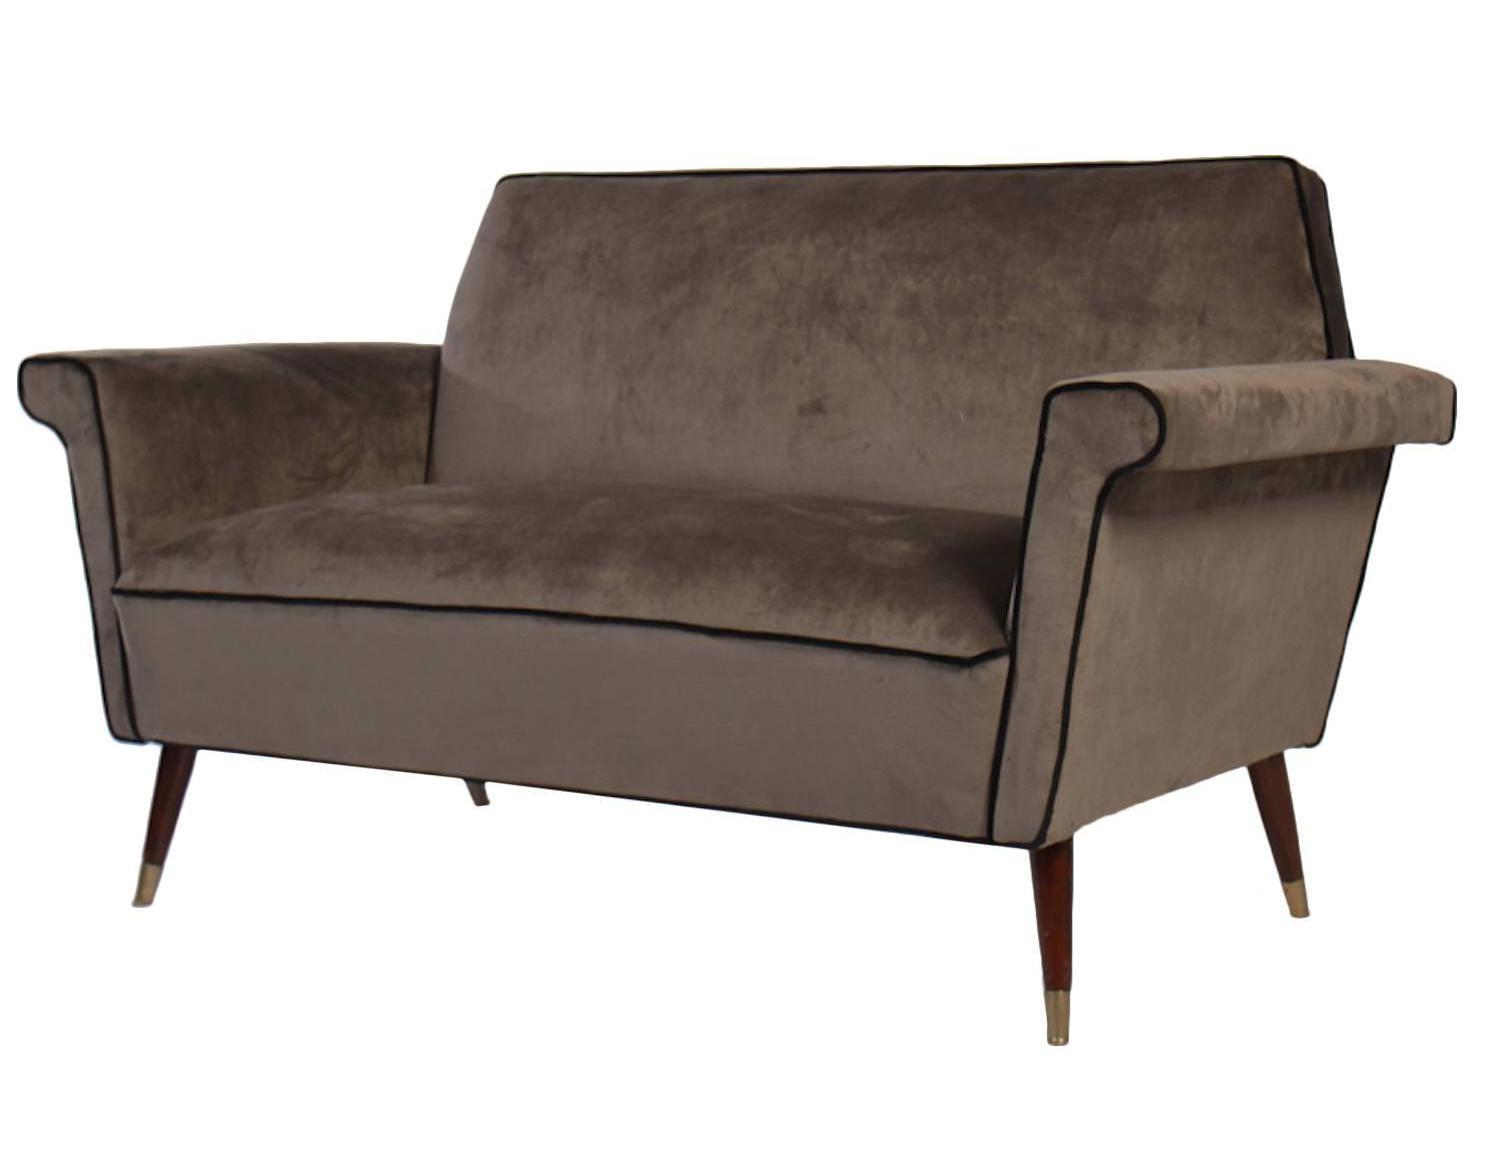 sofa mid century modern furniture seattle